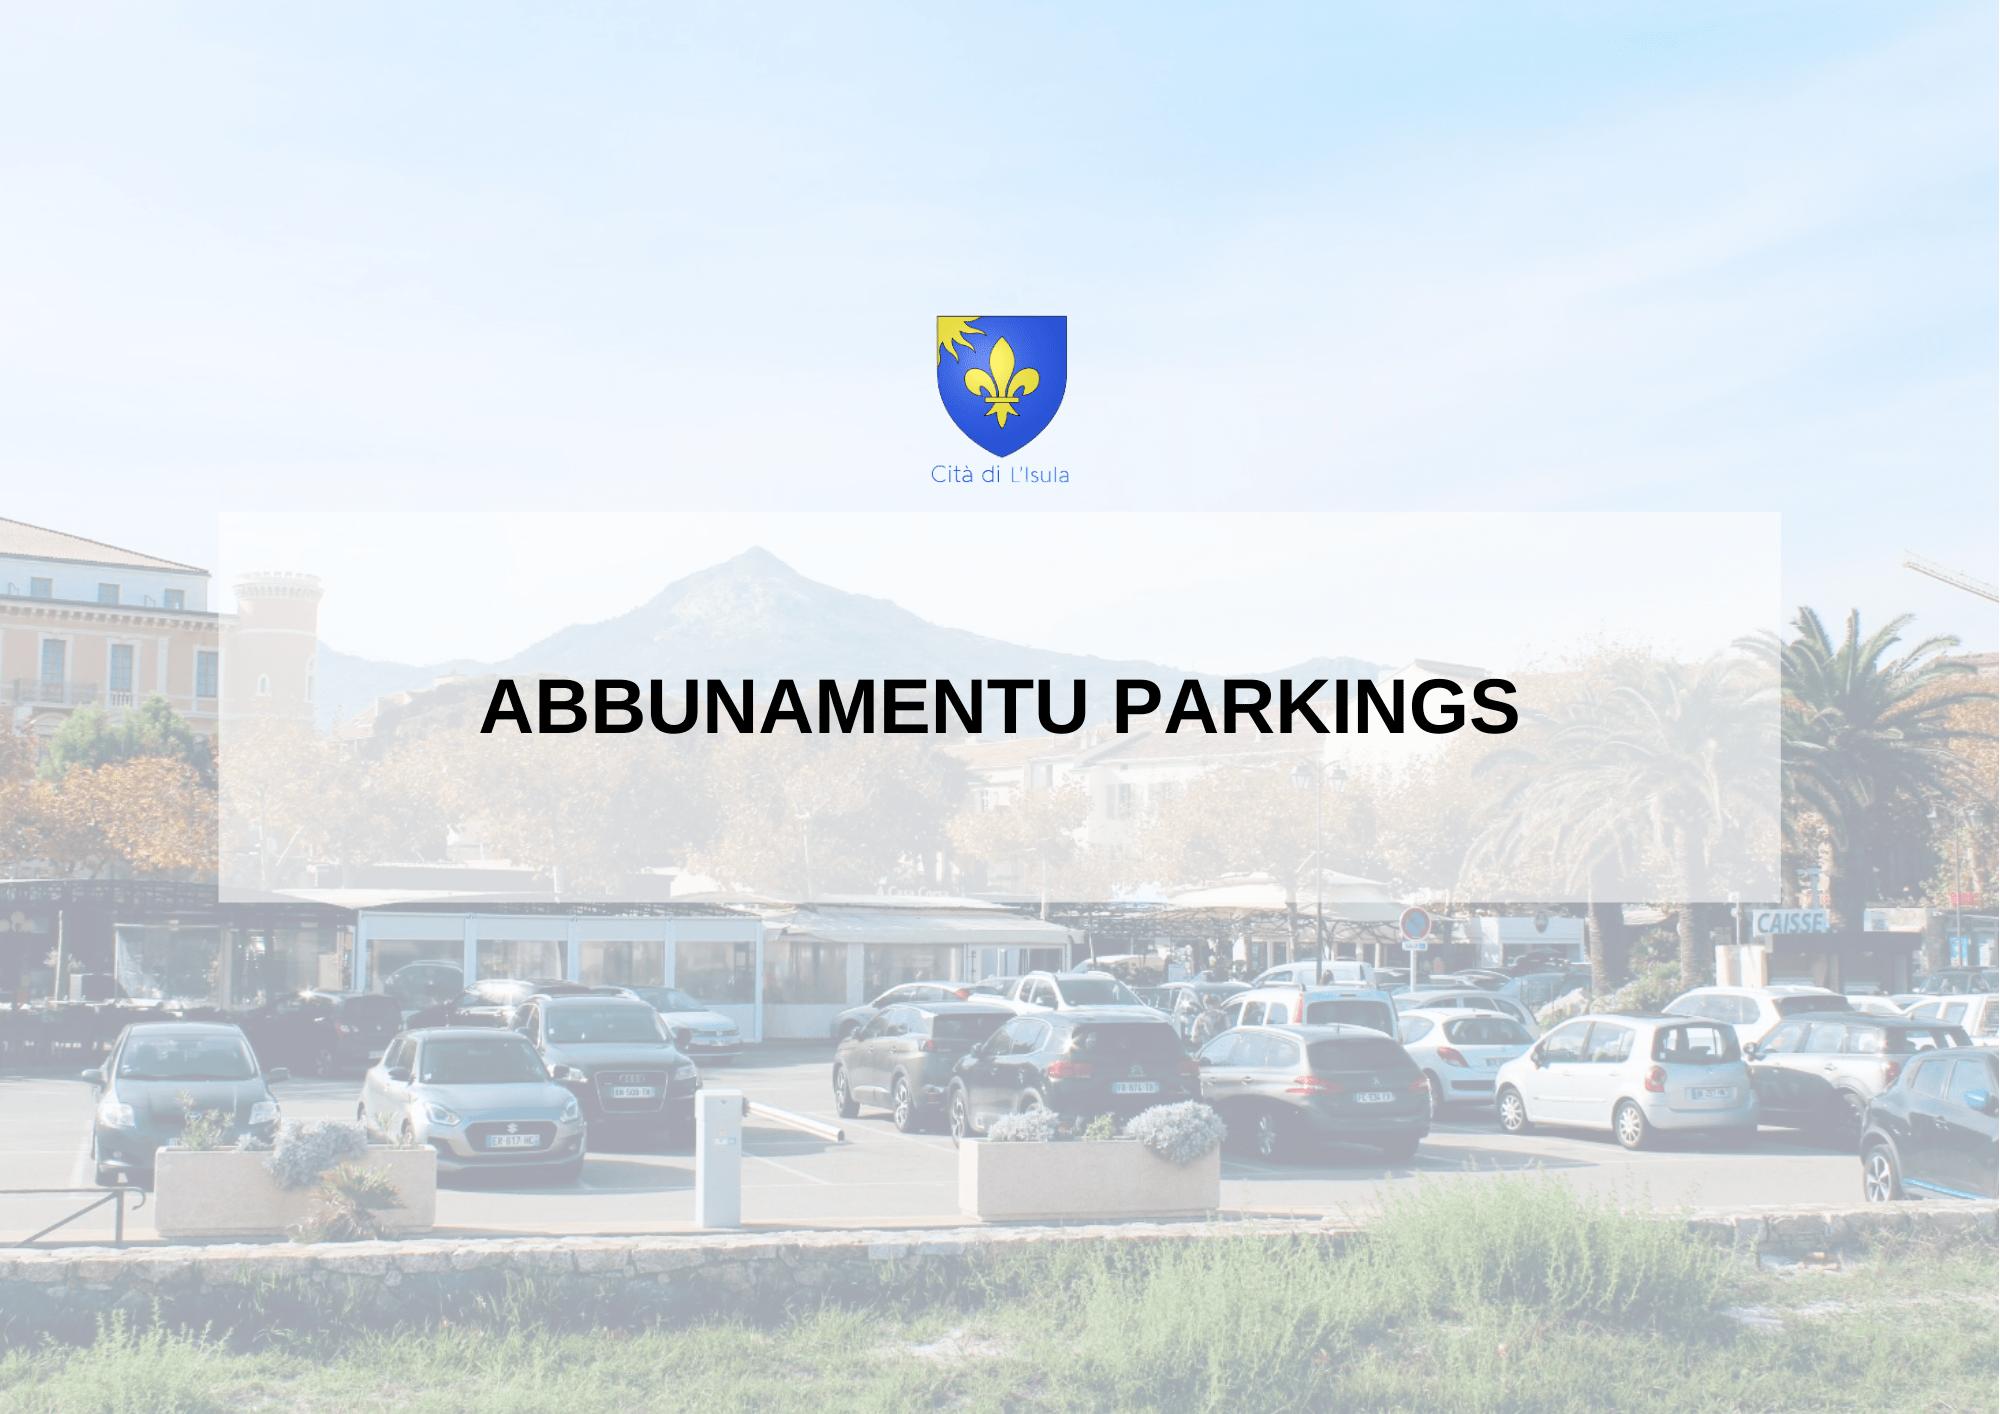 Abbunamentu Parkings – Saison 2021